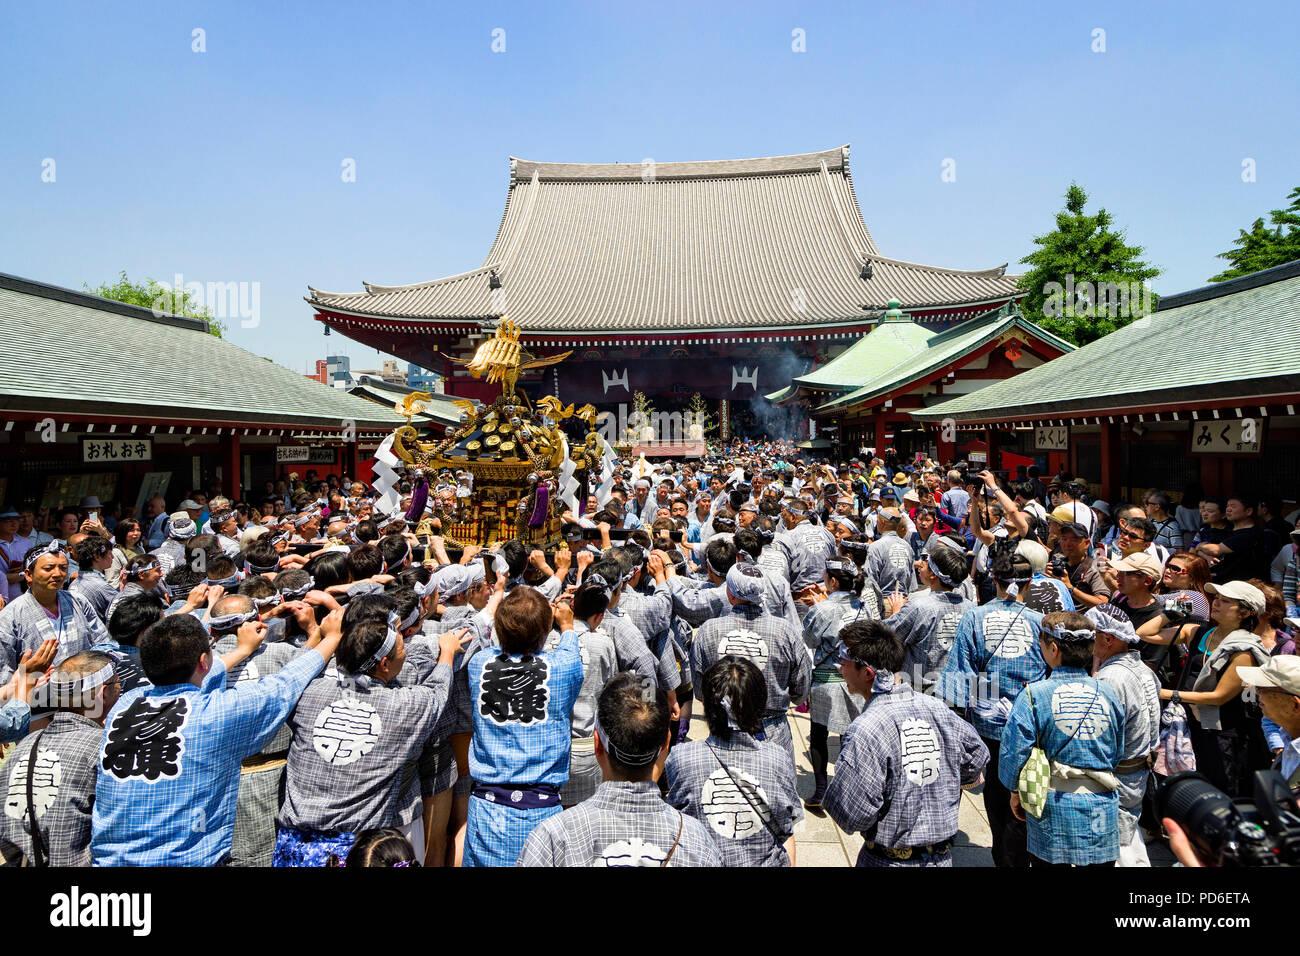 Japan, Insel Honshu, Kanto, Tokio, die Sanja matsuri. Stockfoto